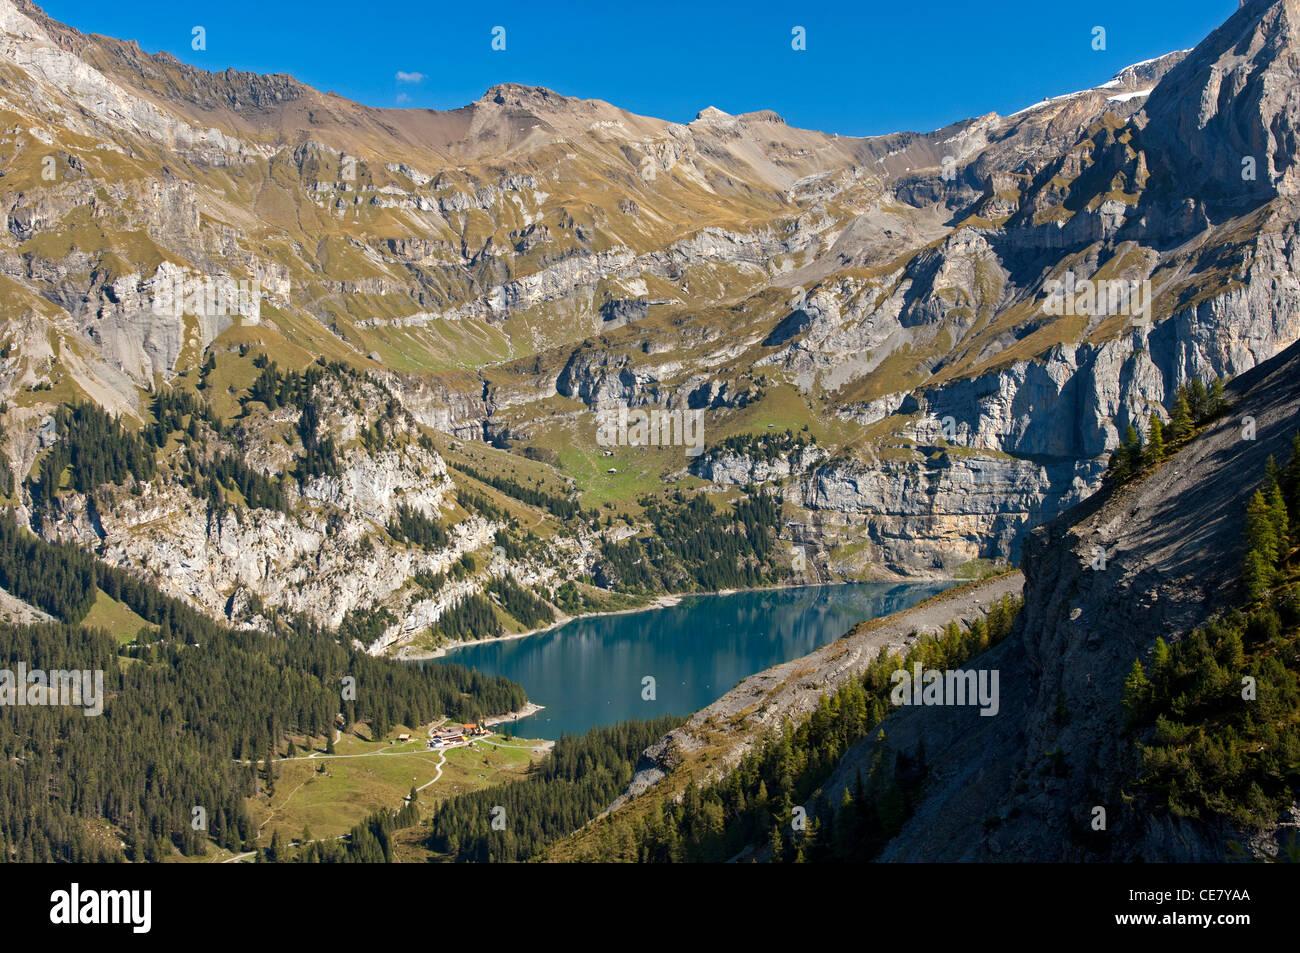 Lake Oeschinenensee at the UNESCO World Heritage site Swiss Alps, Kandersteg, Bernese Oberland, Switzerland - Stock Image